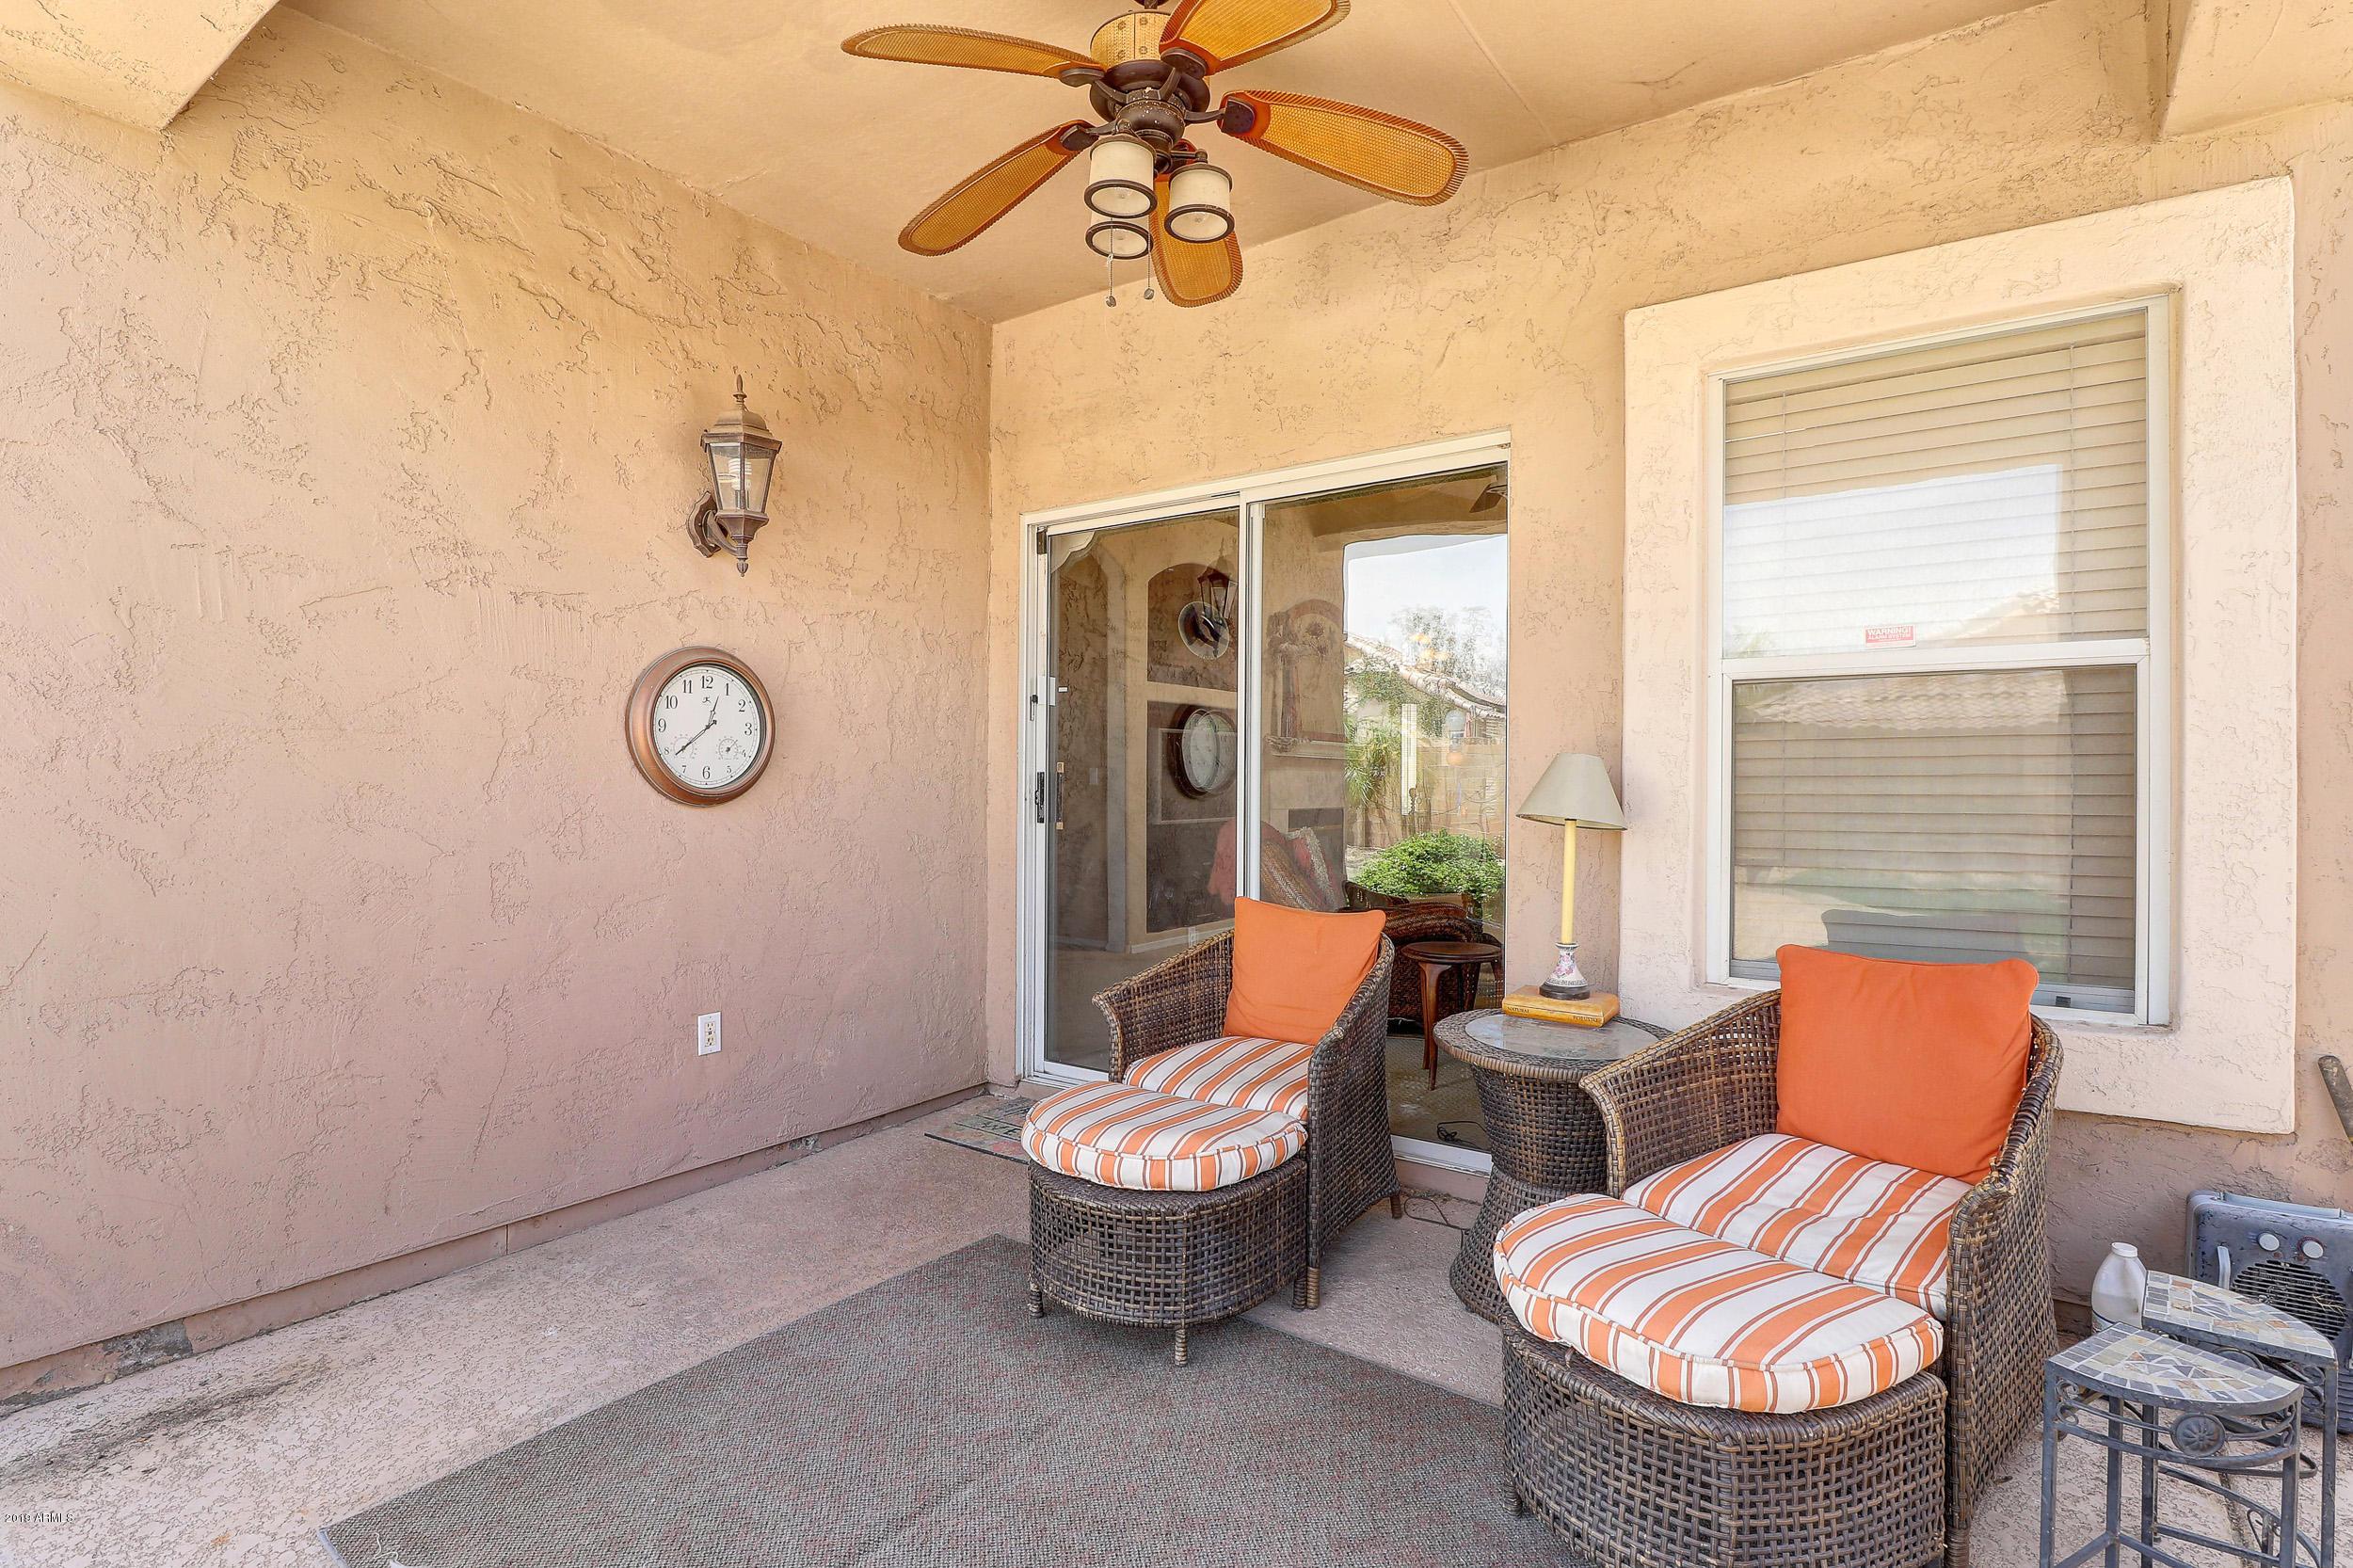 MLS 5924542 11008 W ALMERIA Road, Avondale, AZ 85392 Avondale AZ Crystal Gardens